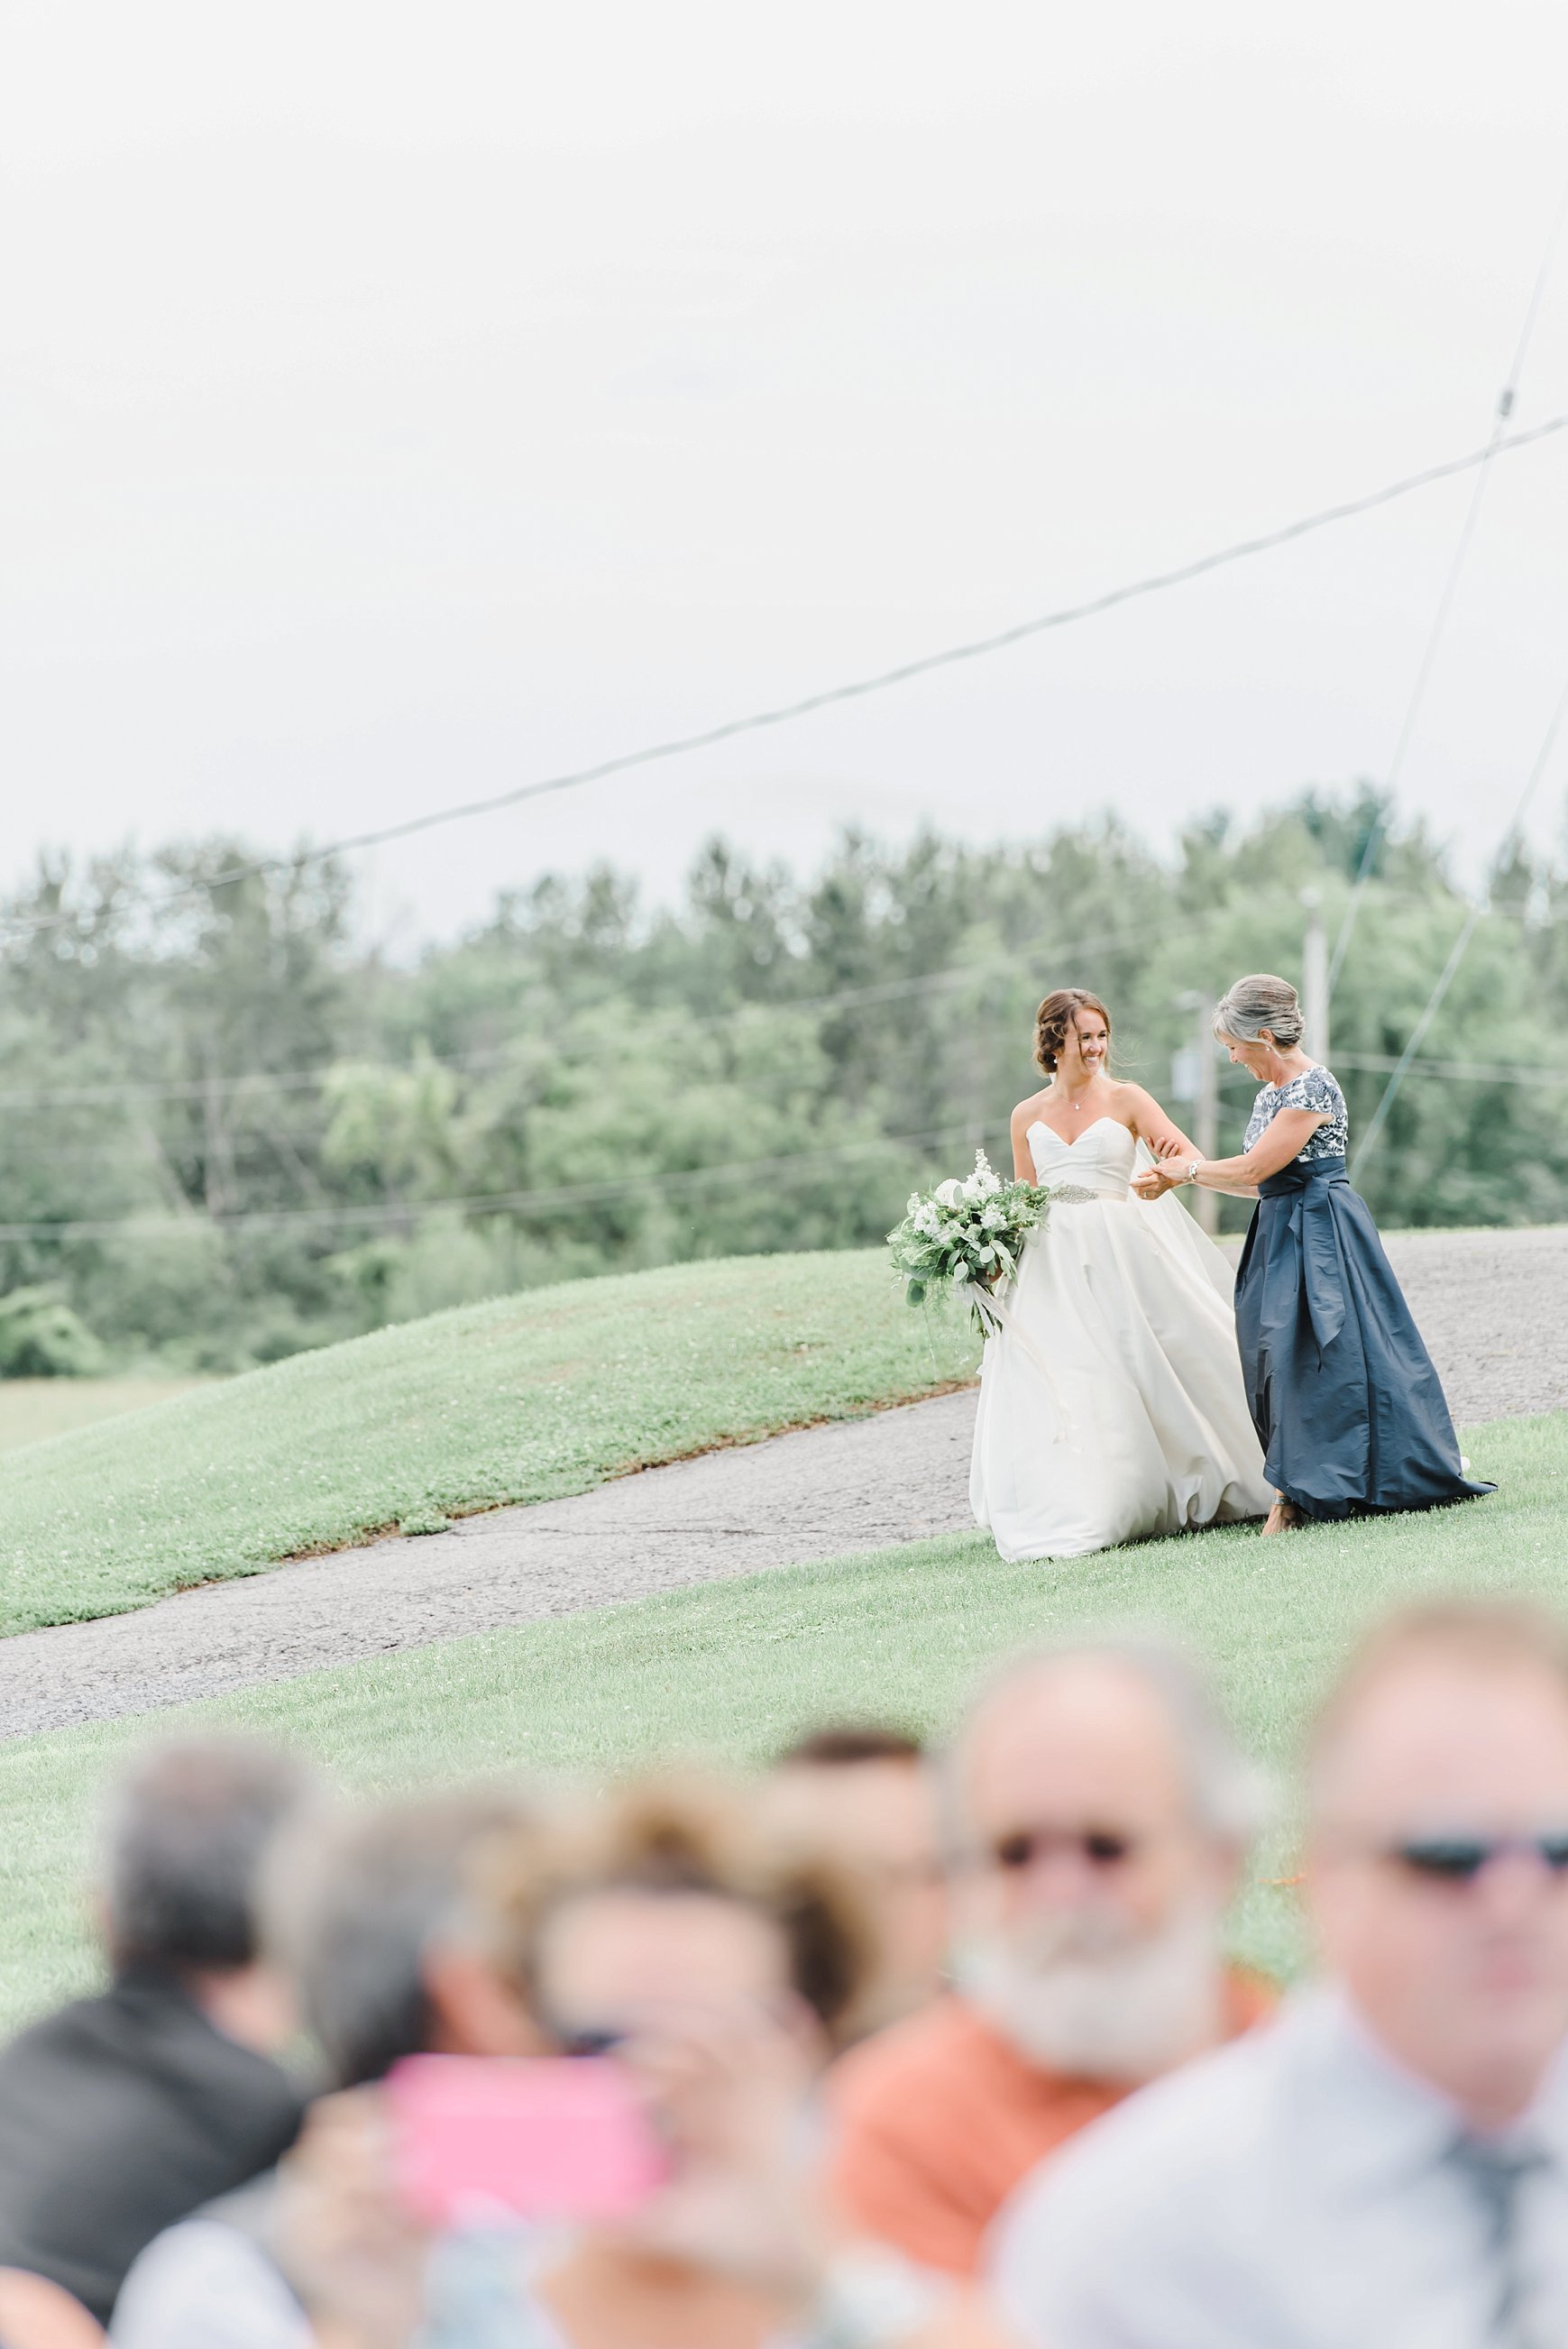 light airy indie fine art ottawa wedding photographer | Ali and Batoul Photography_0531.jpg